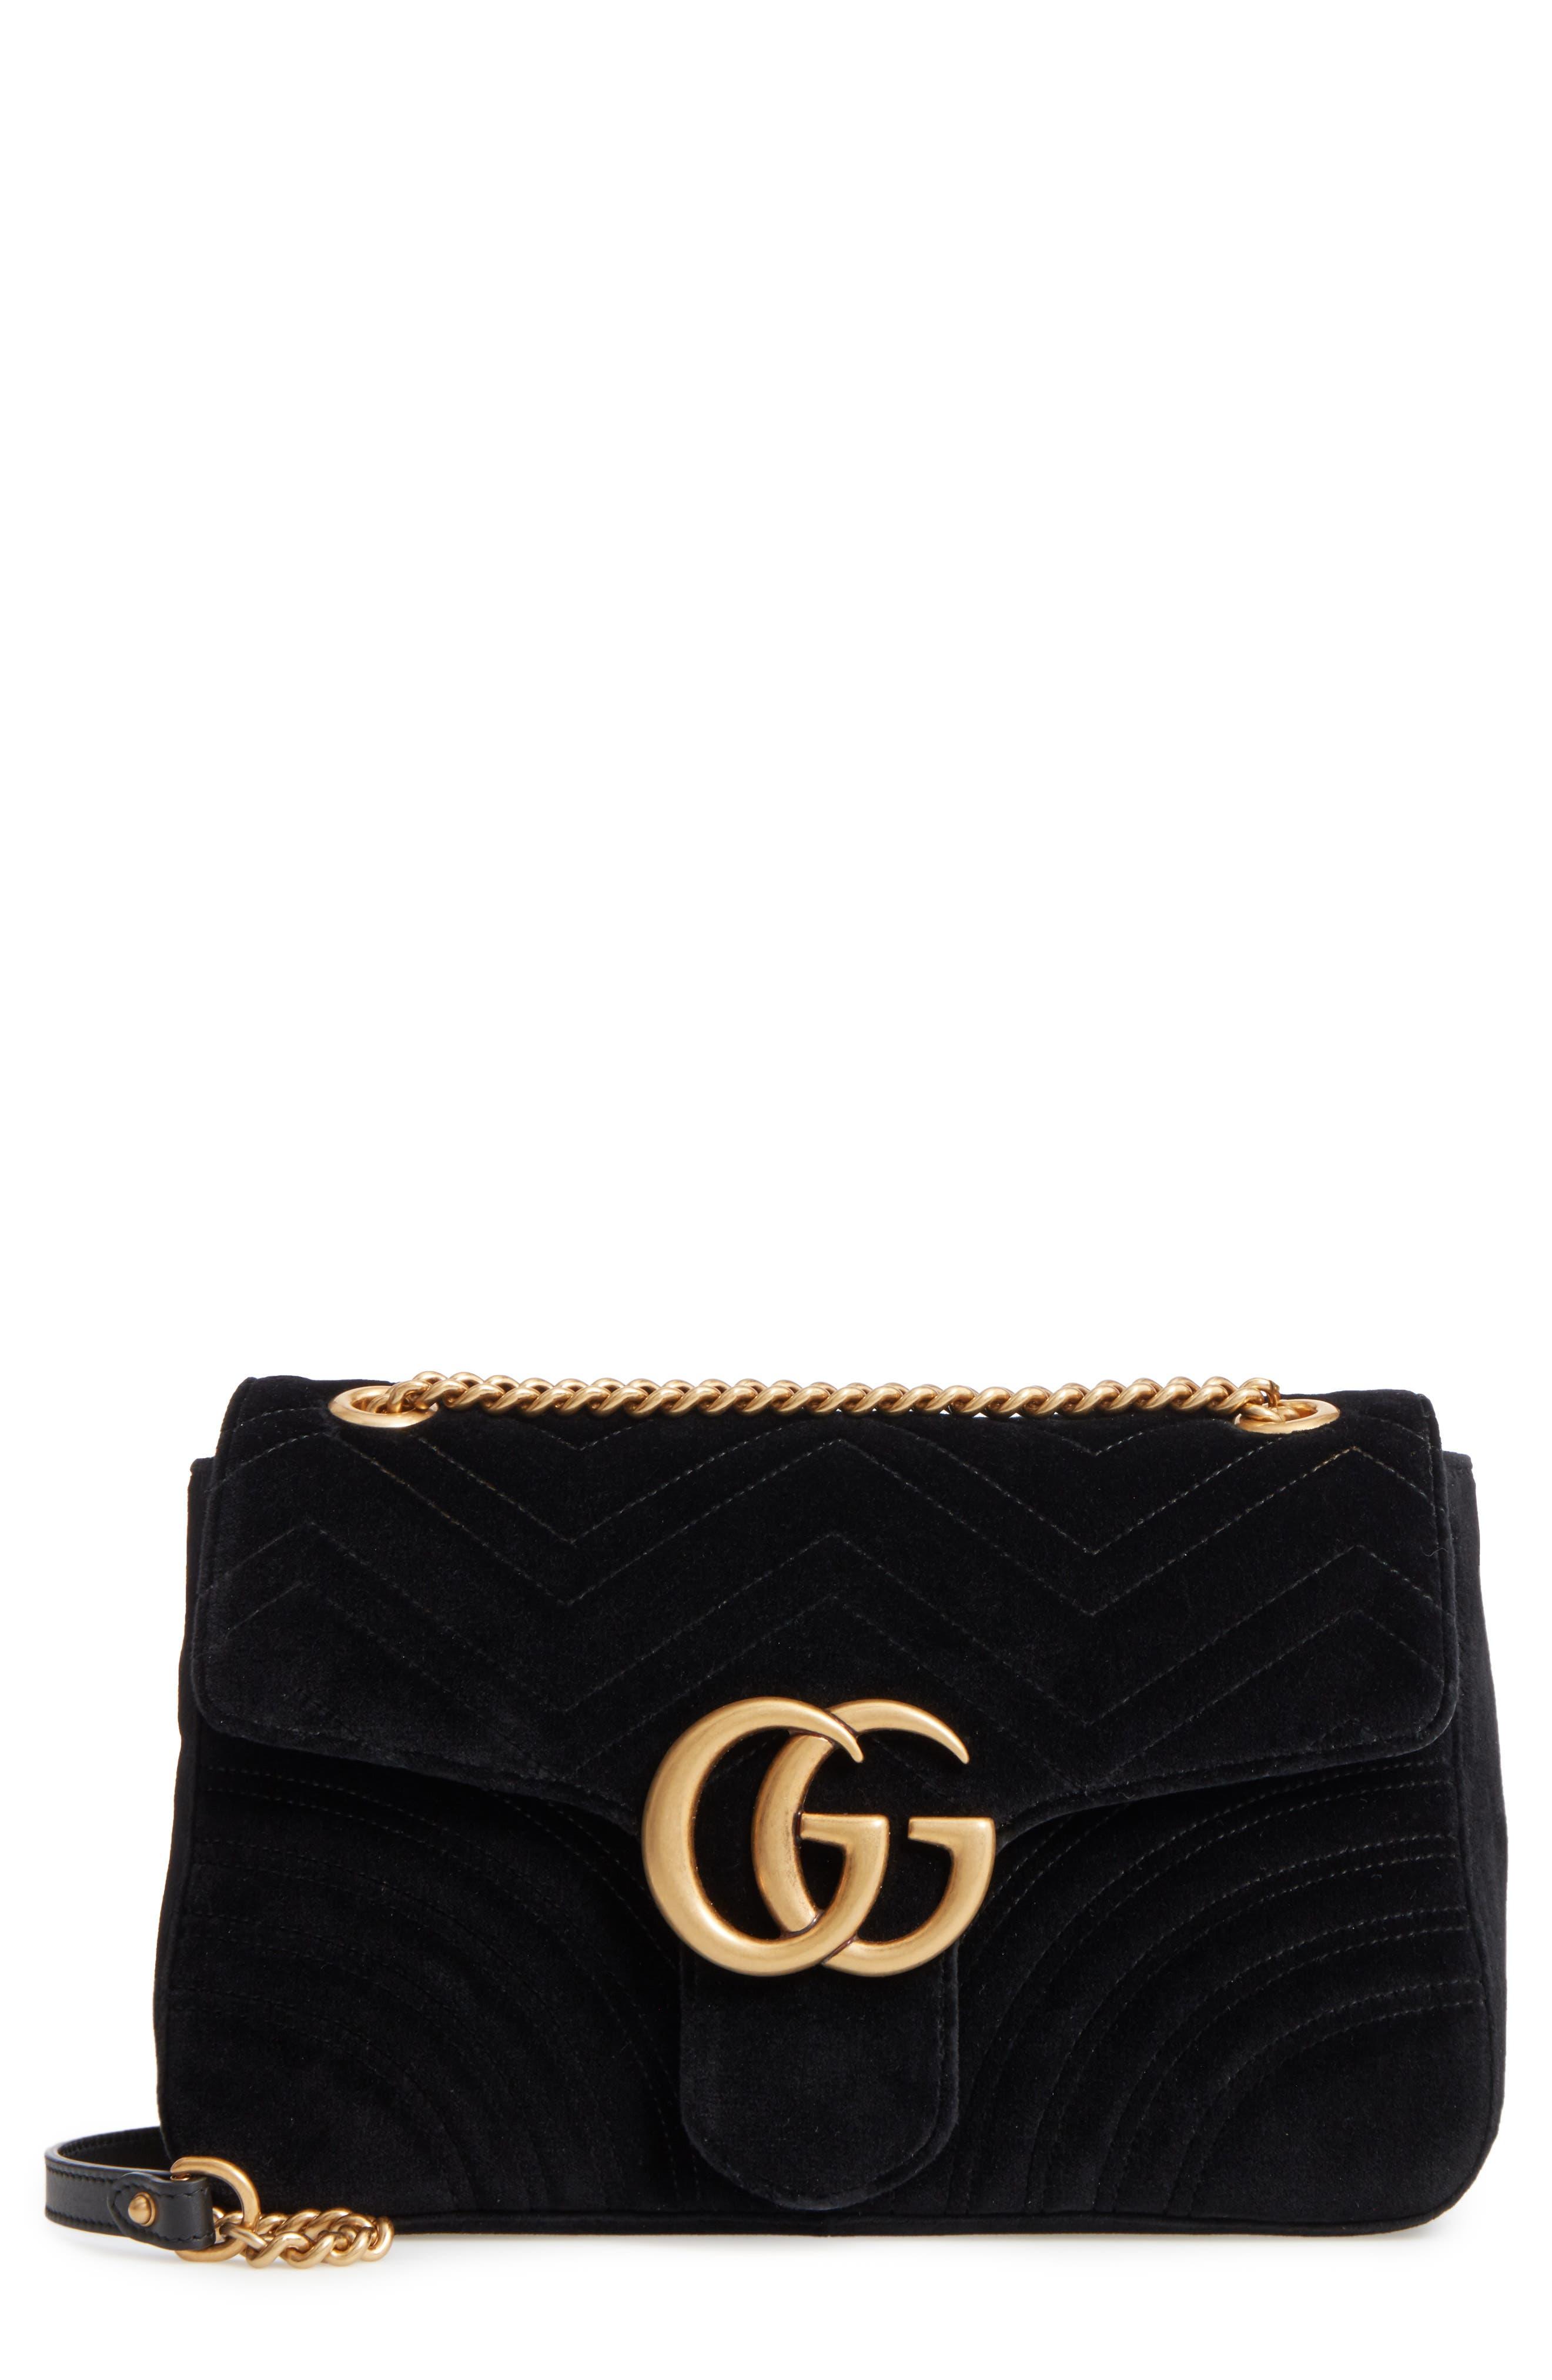 ,                             Medium GG Marmont 2.0 Matelassé Velvet Shoulder Bag,                             Main thumbnail 1, color,                             NERO